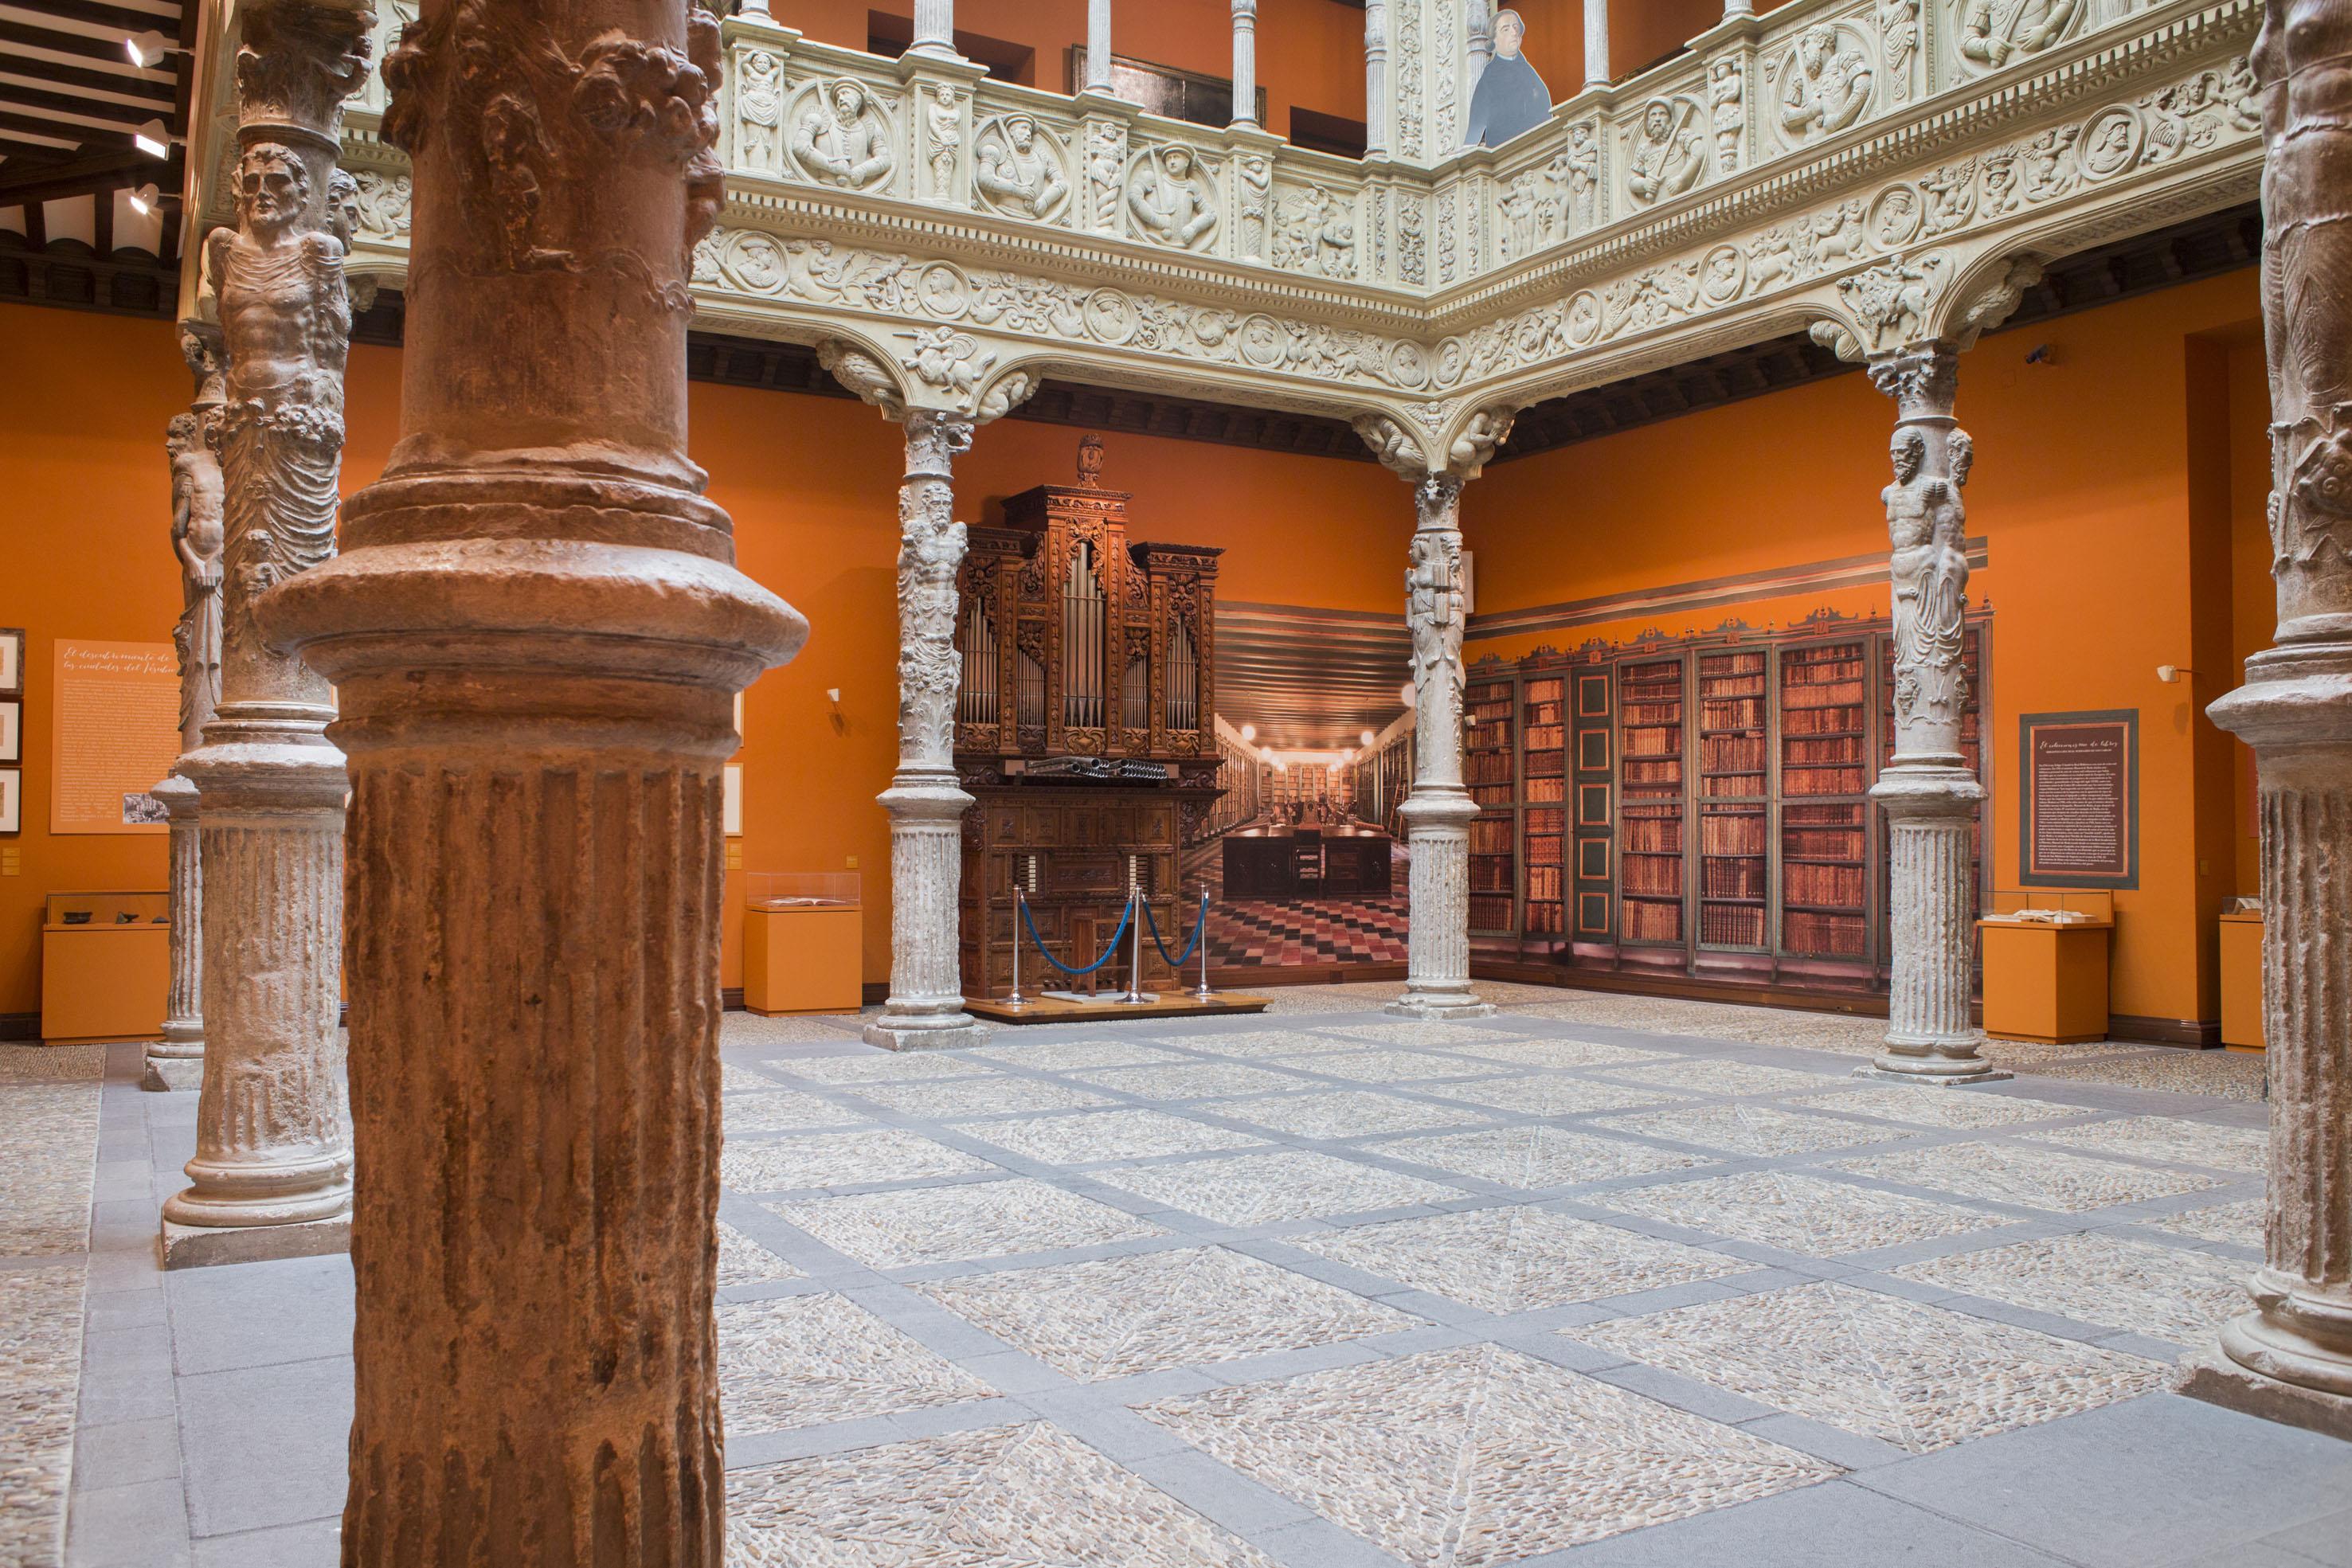 Horóscopo esculpido en las columnas del piso inferior. Foto: Ibercaja. Obra Social